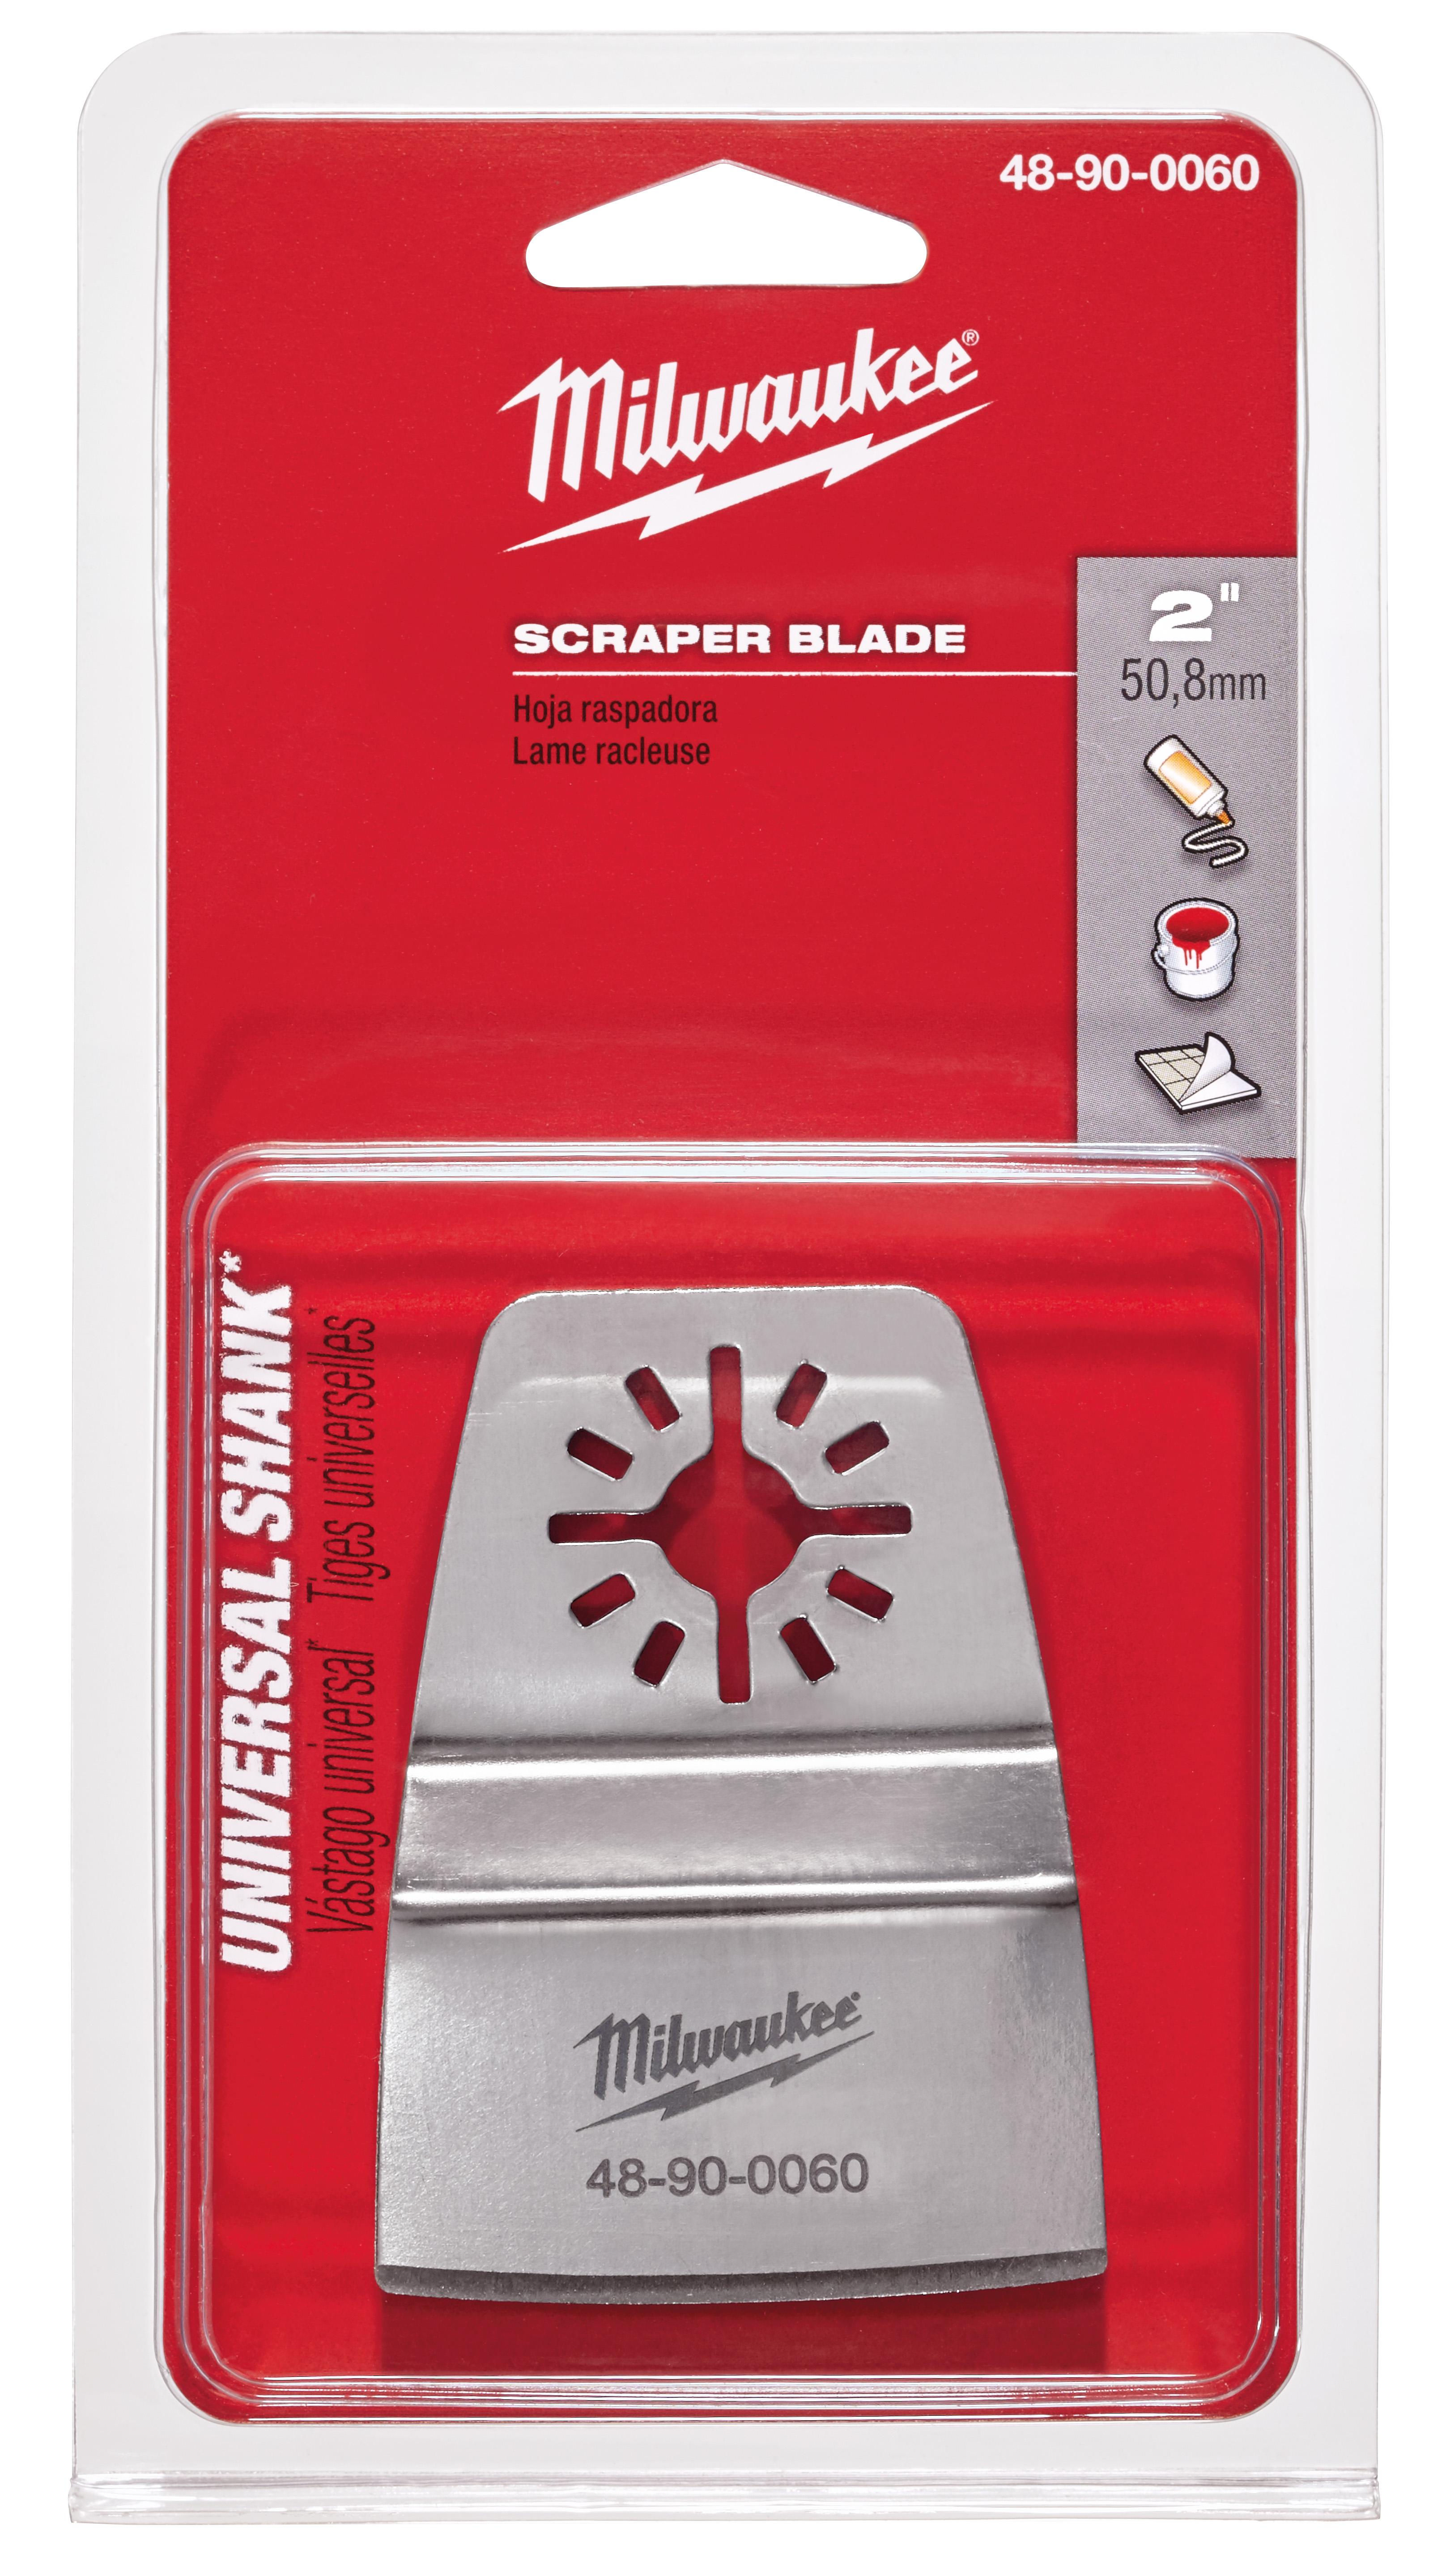 Milwaukee 48-90-0060 Scraper Blade